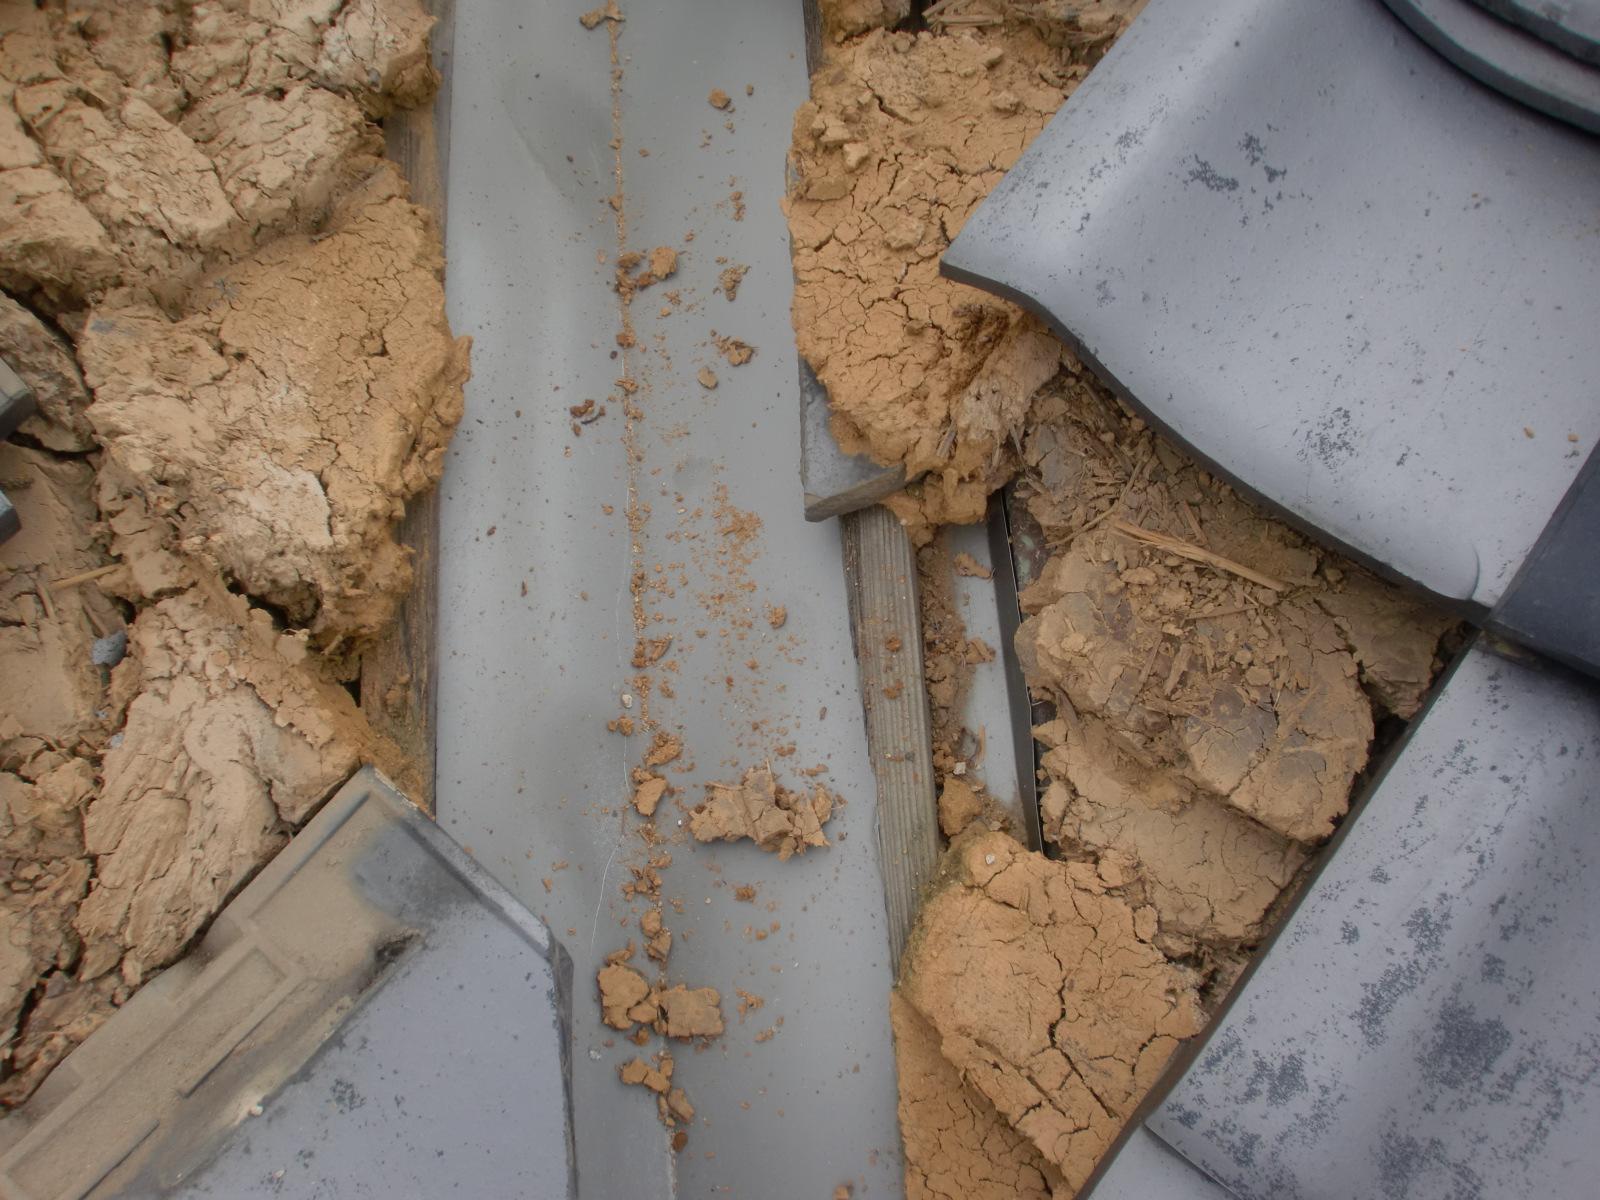 雨漏り修理 津市 谷部分